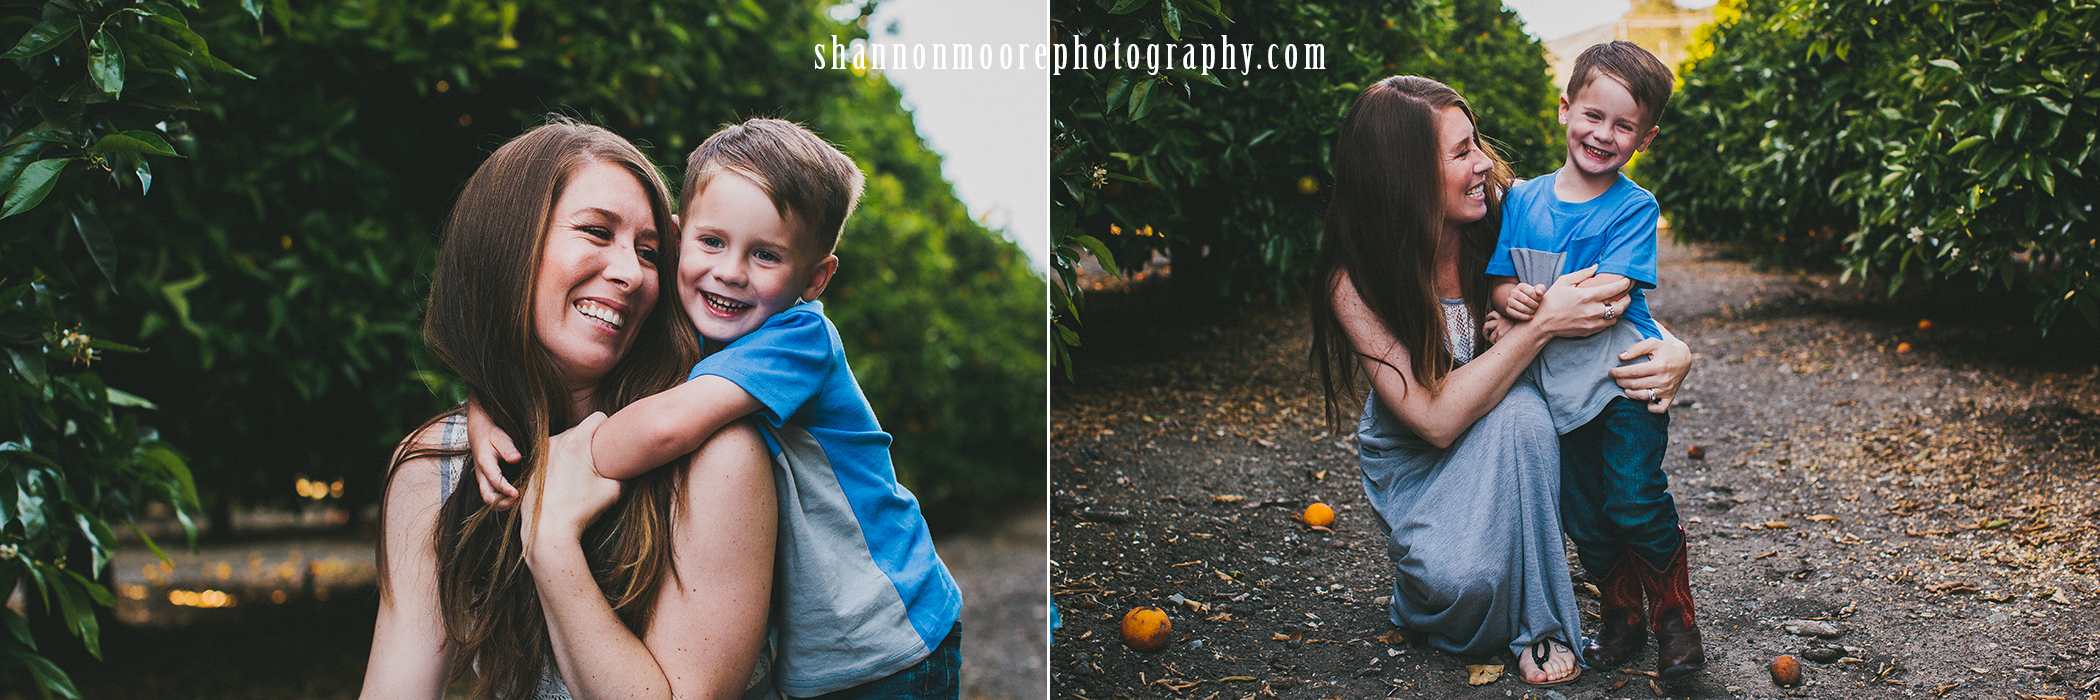 ShannonMoorePhotography-FamilyPhotography-SanLuisObispo-Ca-11